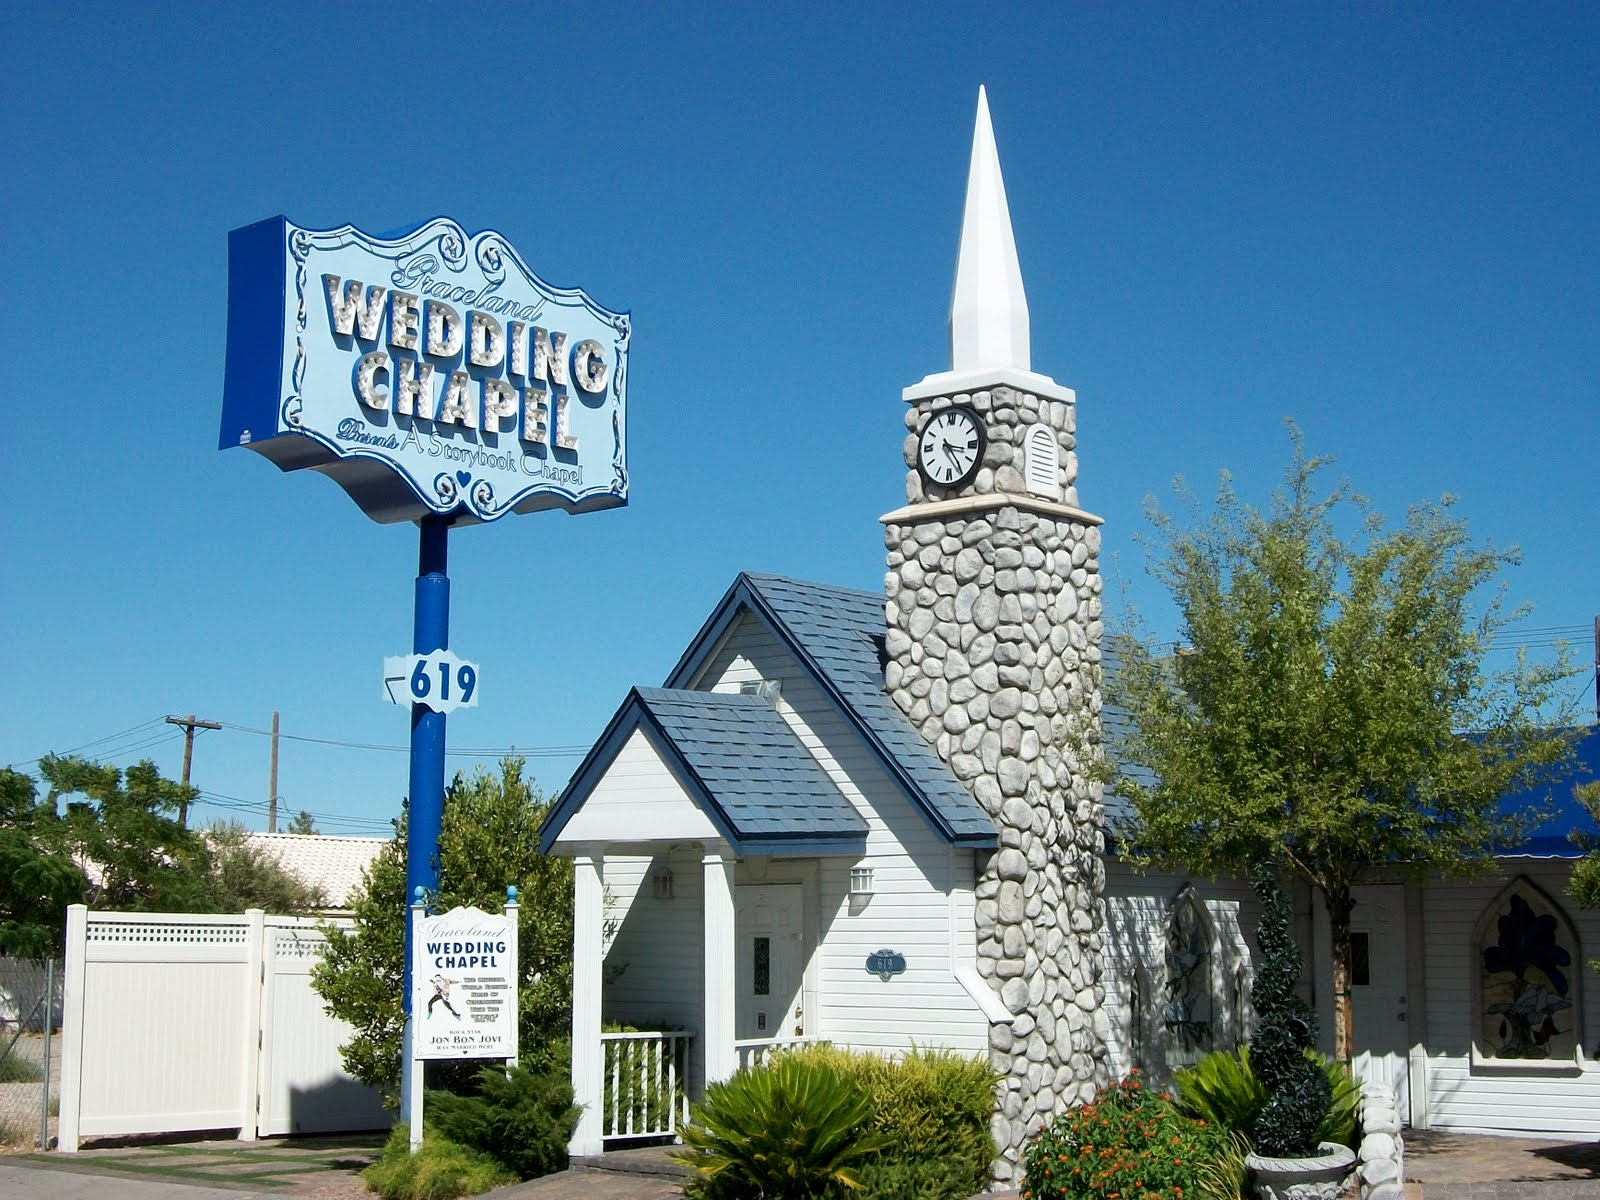 elvis graceland wedding chapel FlLVskALmRdvnzNuzUAEMYTI vegas wedding chapels Wedding Chapel Las Vegas Burning